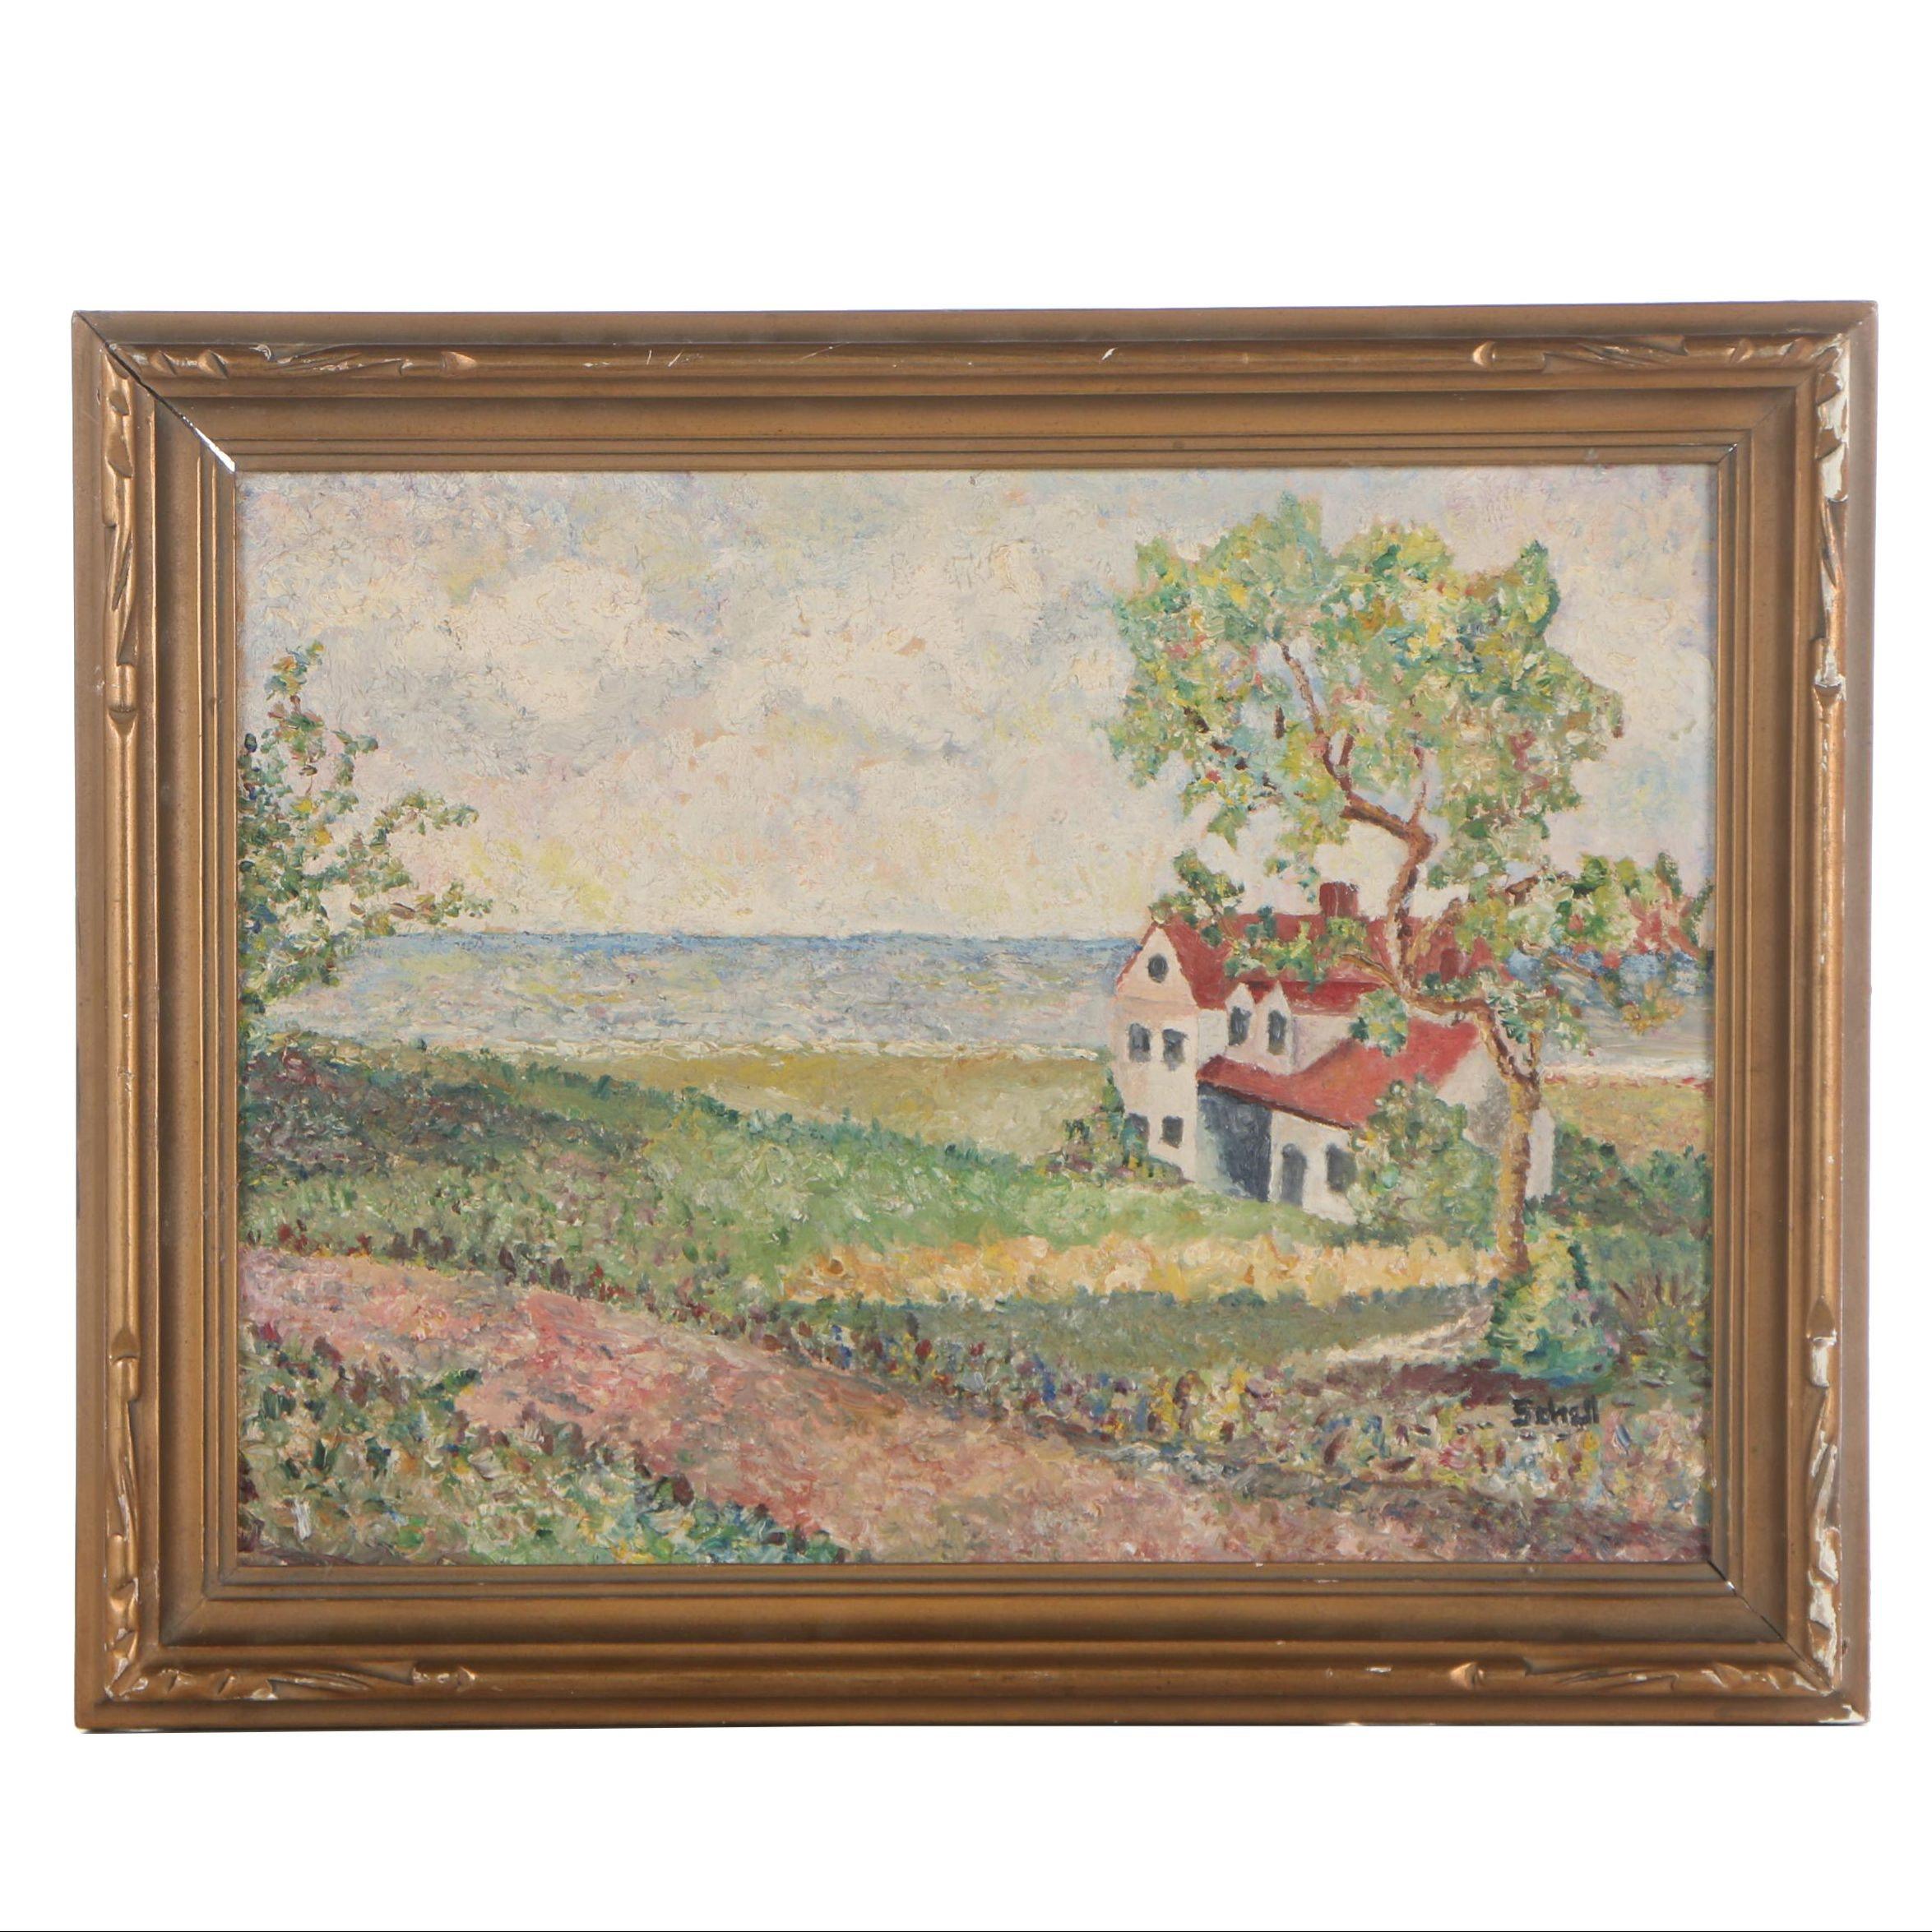 Schell Pastoral Landscape Oil Painting